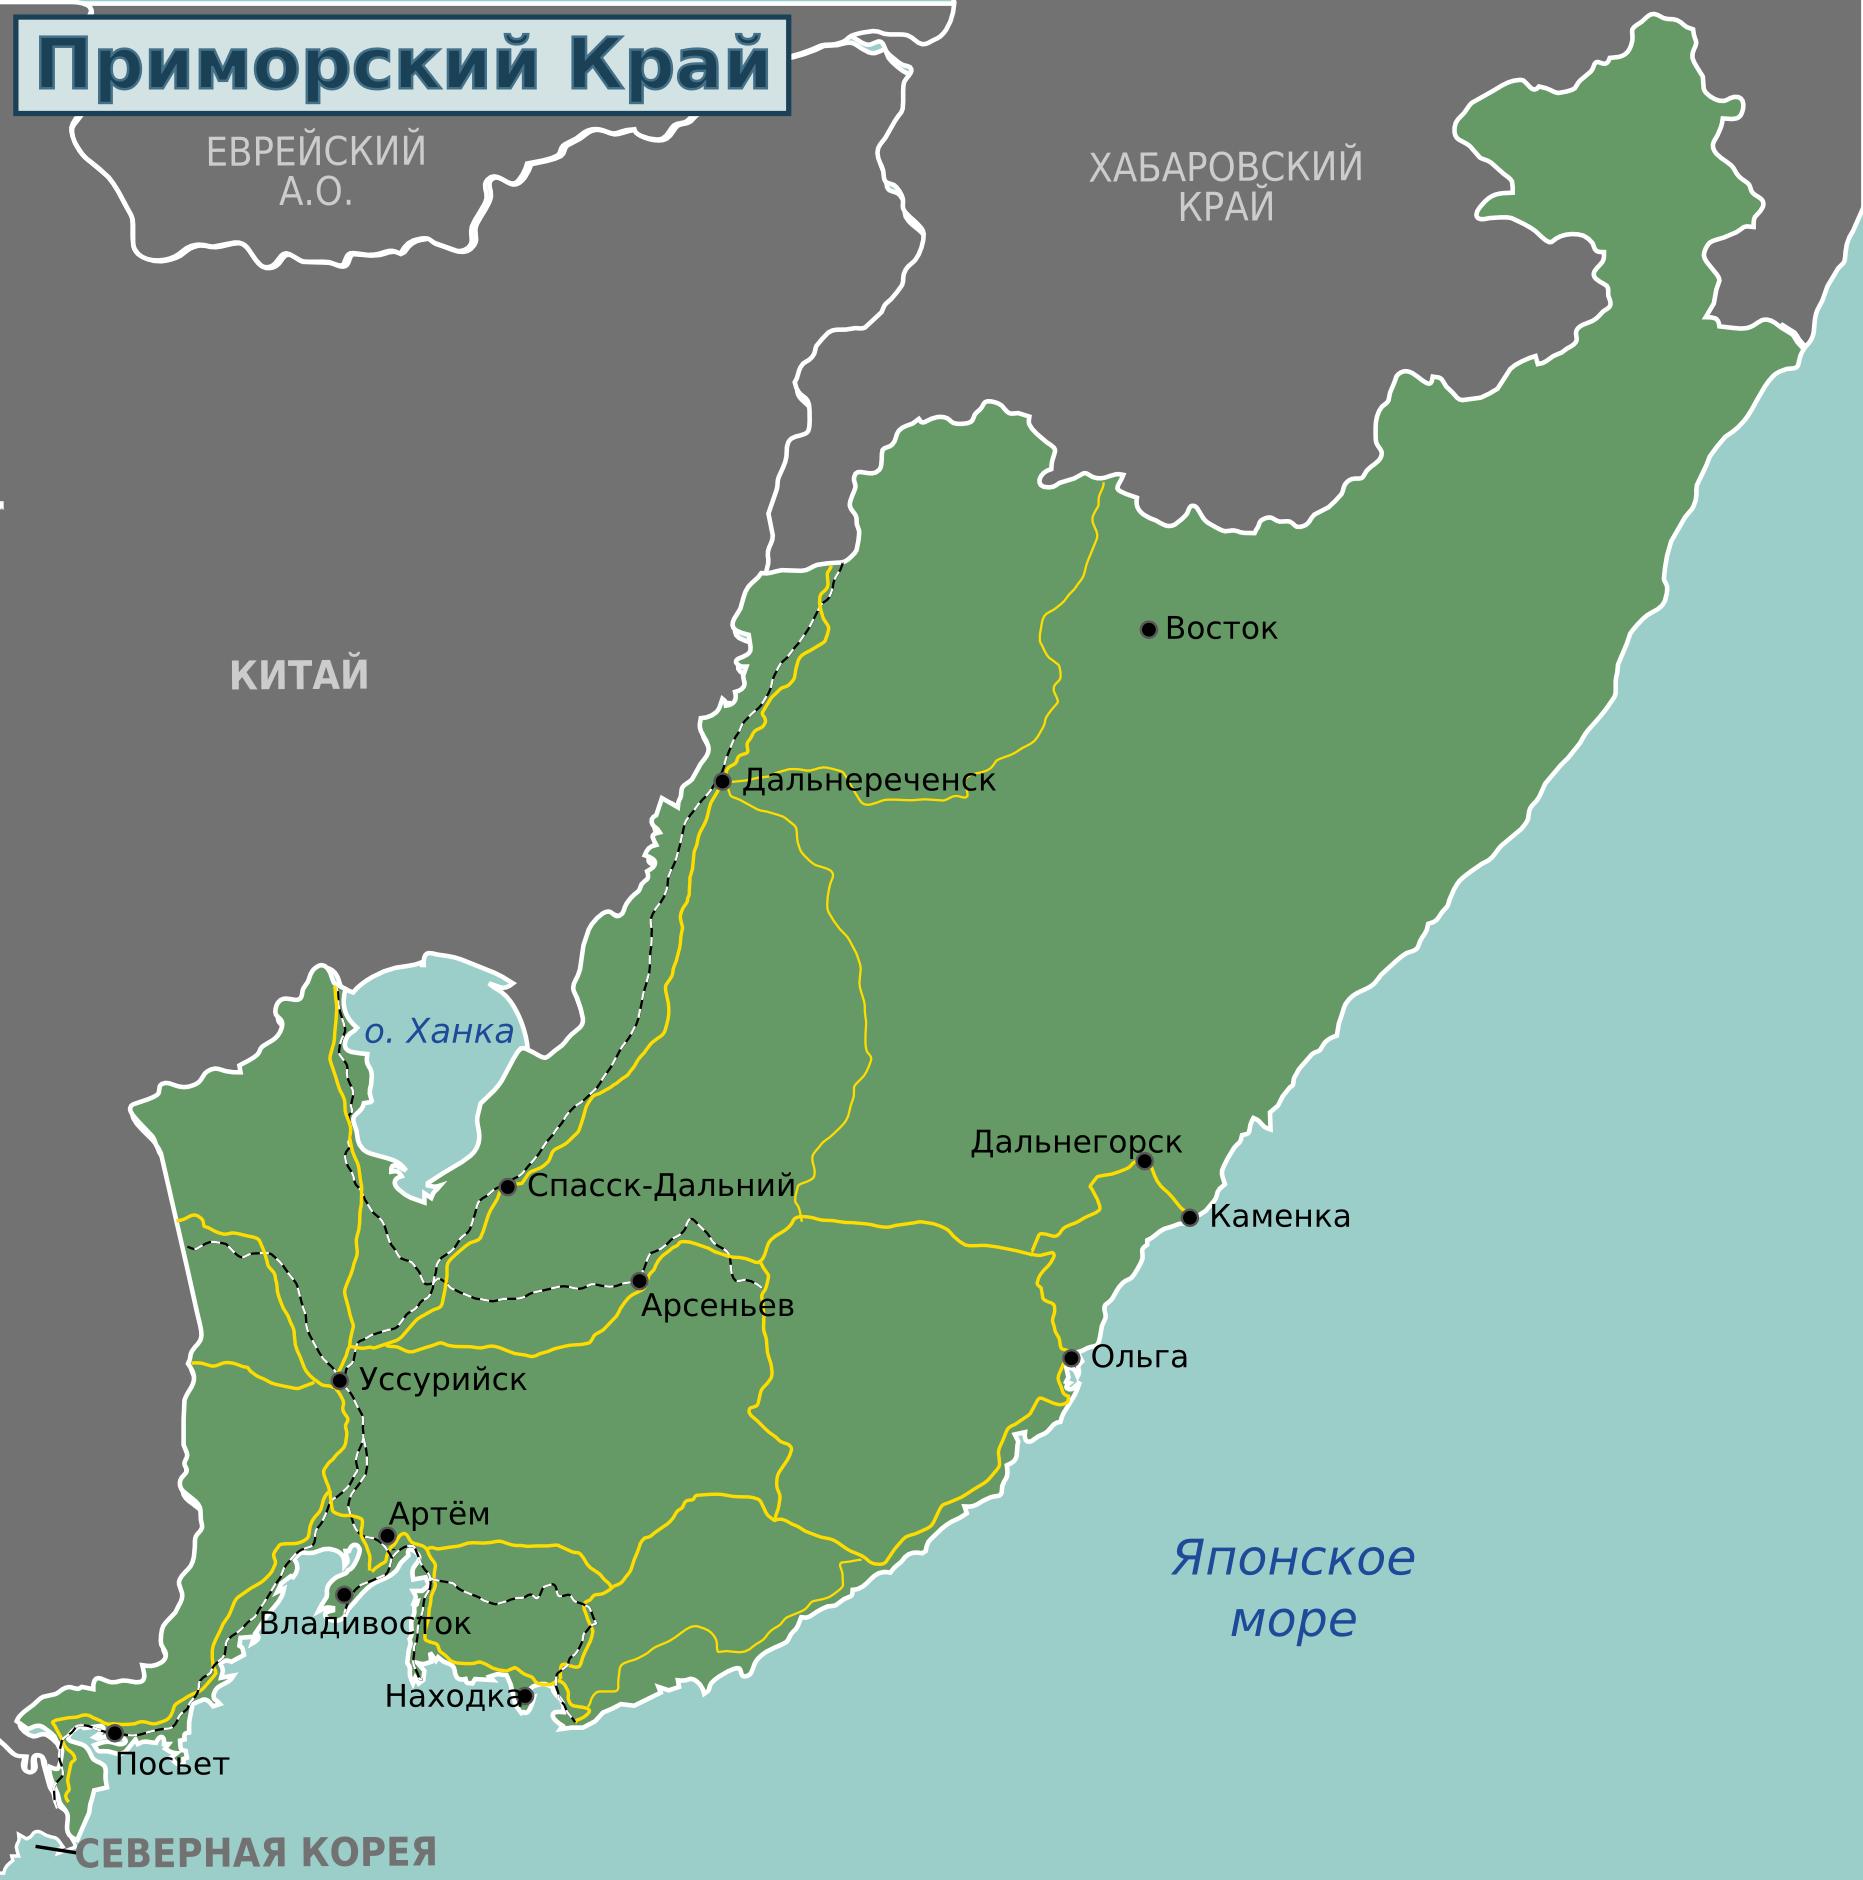 primorsky_krai_map_ru